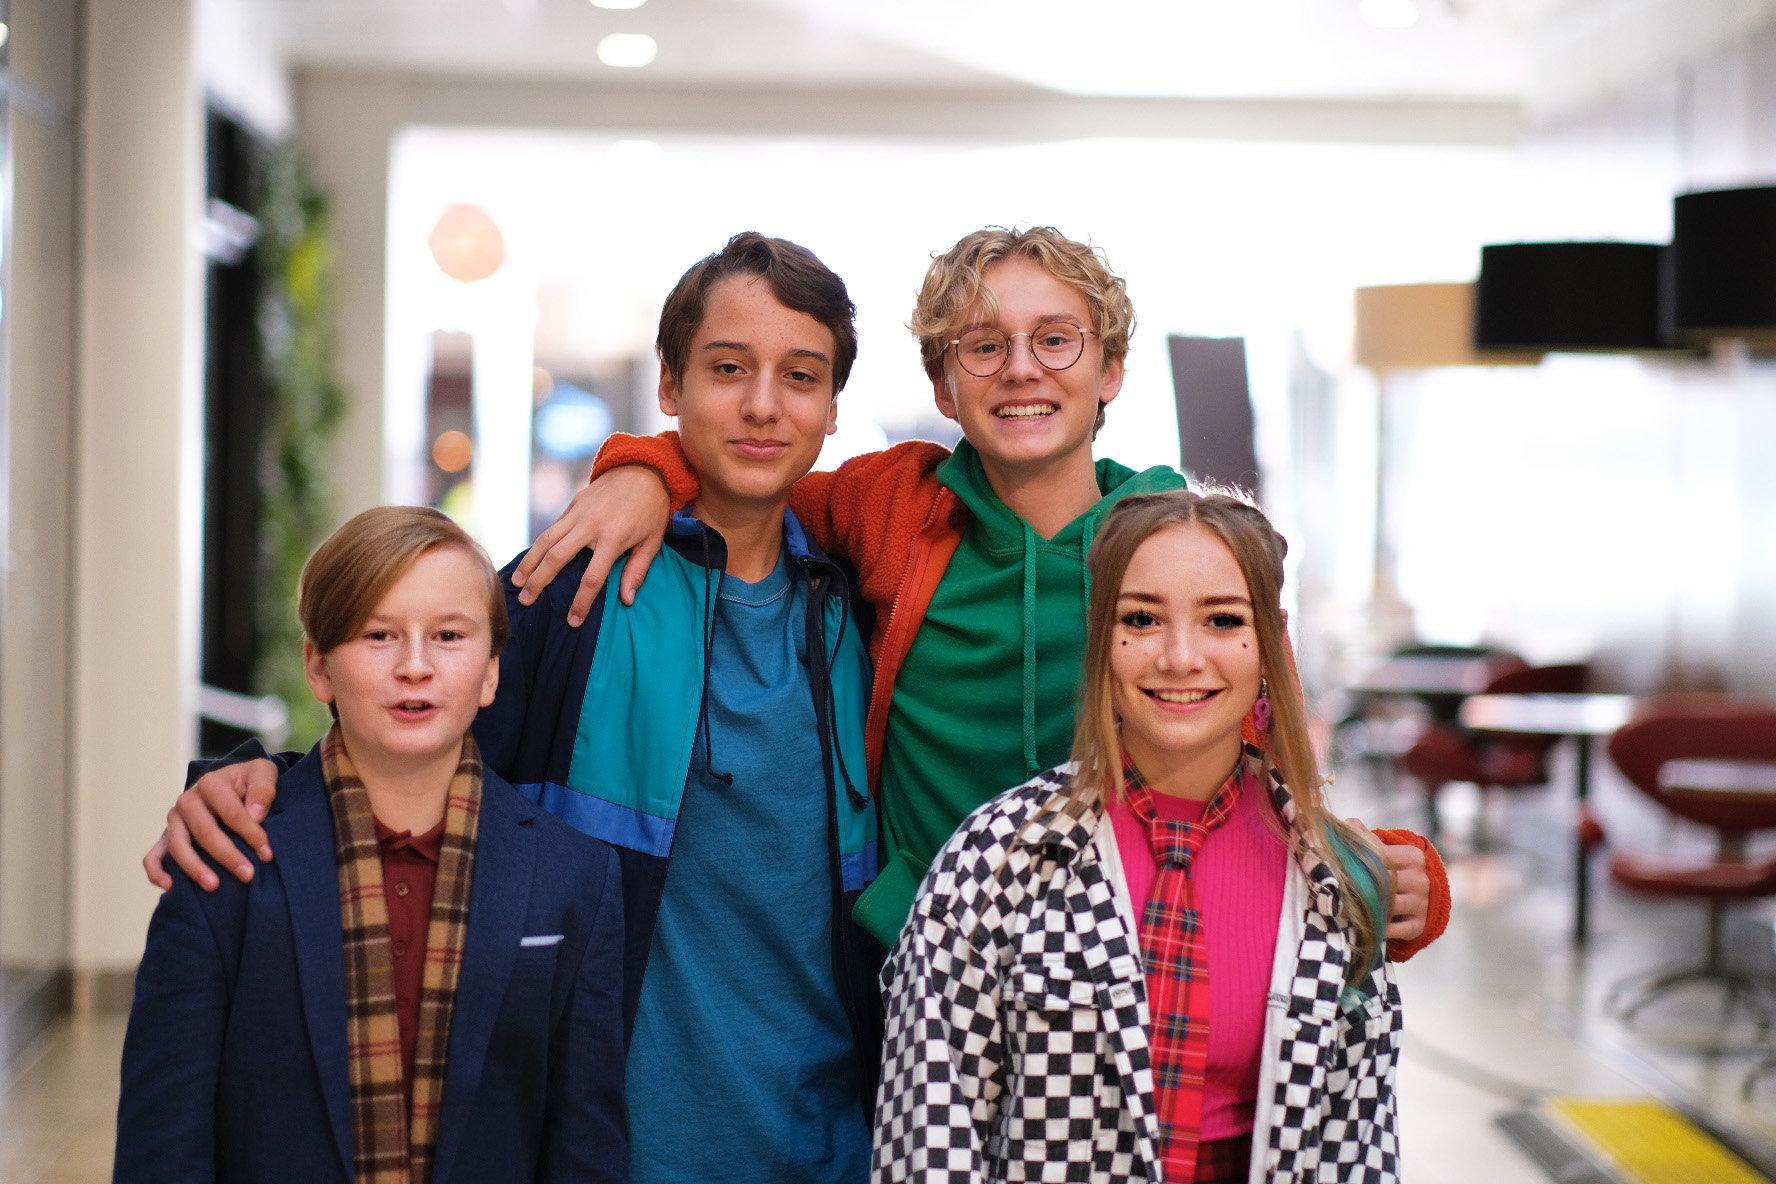 Lill-Erik (Arvid Bergelv), Åke (Samy Karlsson Fariat), Bert (Adrian Macéus) och Thora (Lily Wahlsteen). Pressbild.